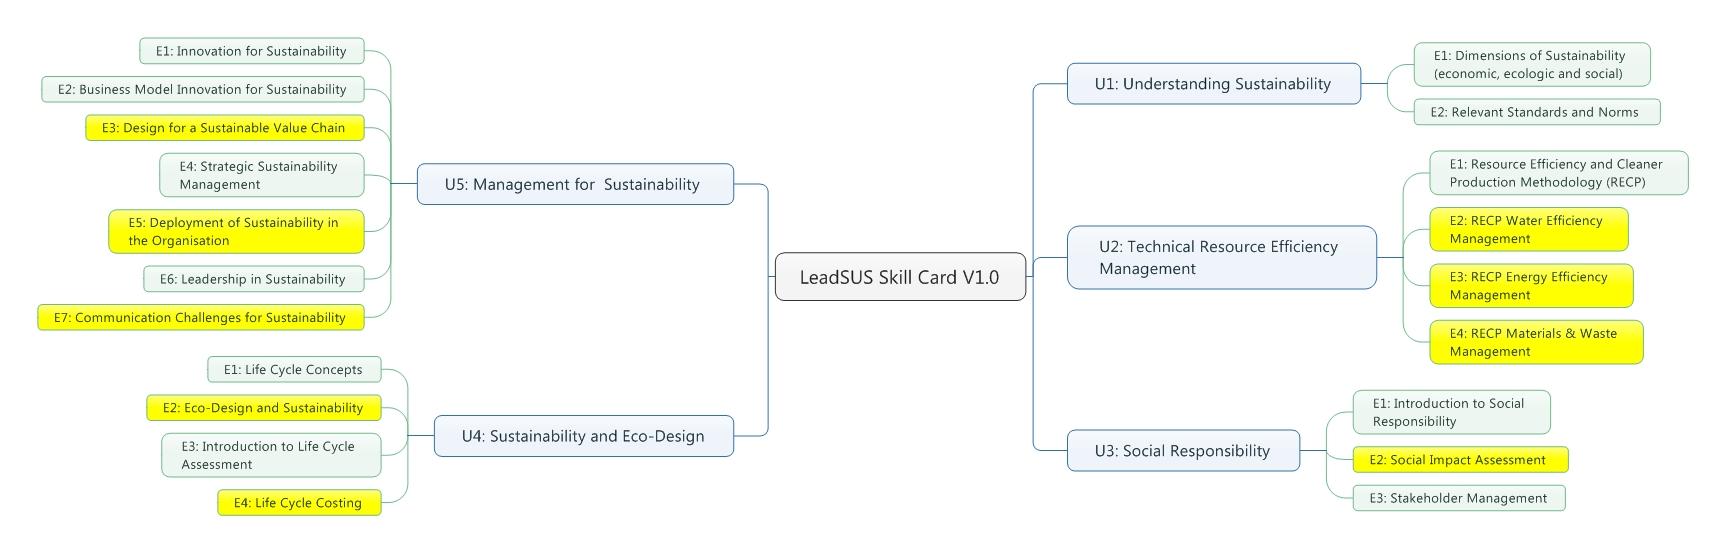 Leadsus skill card 2